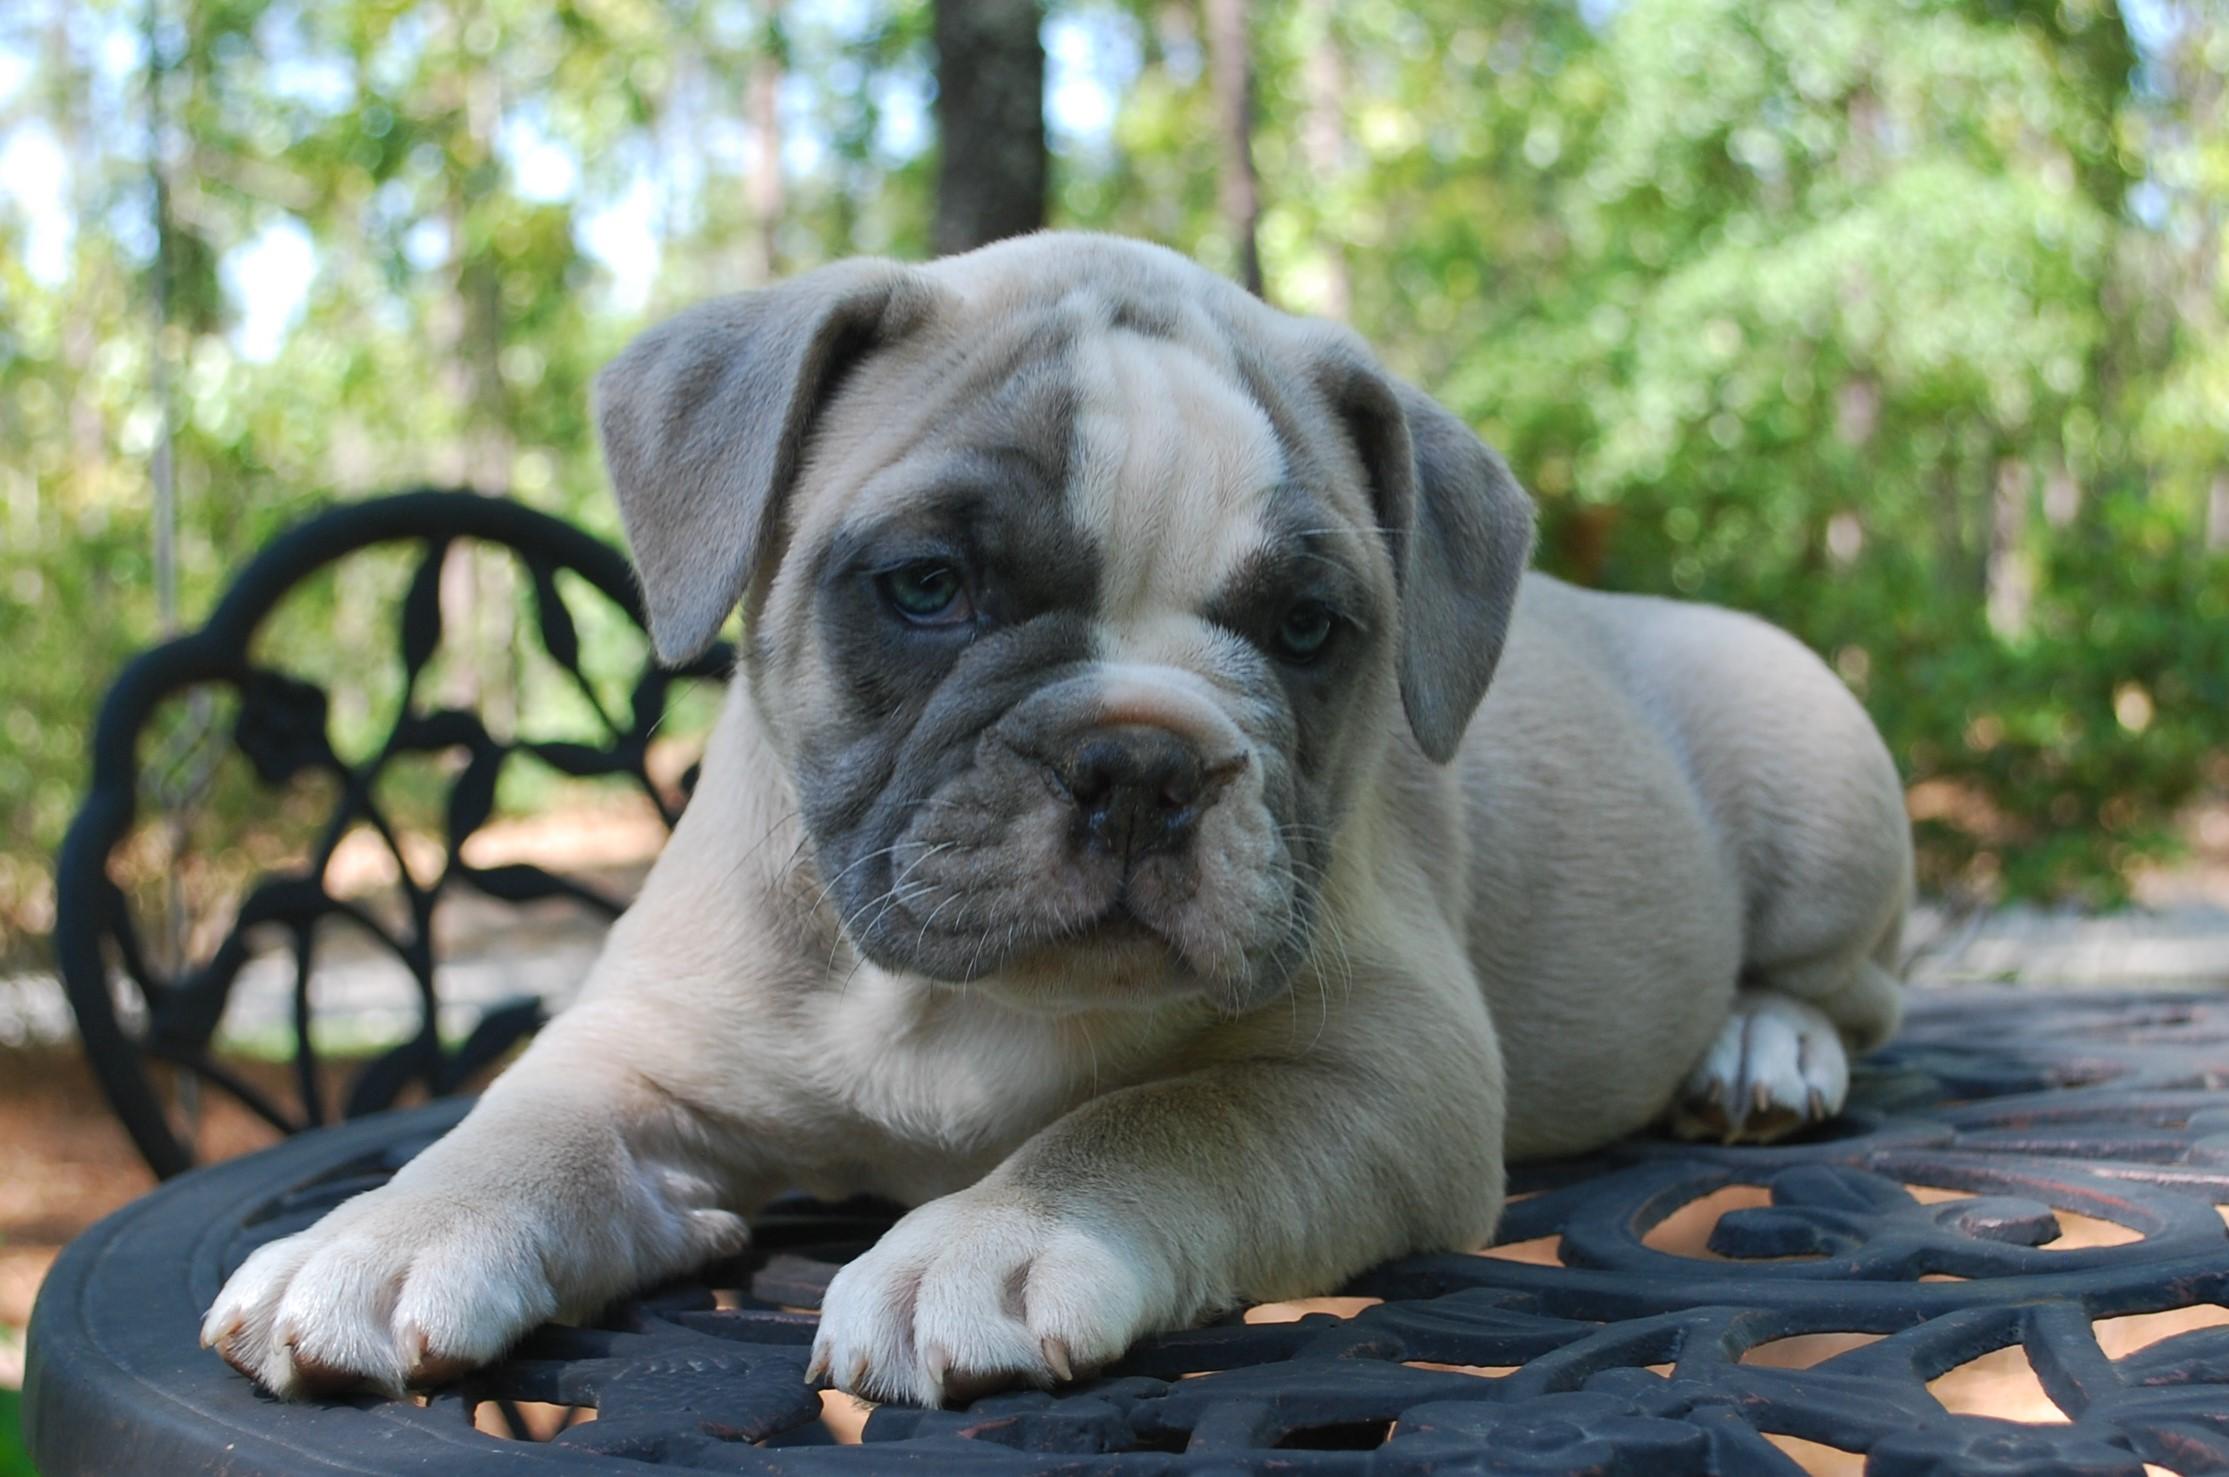 Blossom Olde English Bulldogge Puppy For Sale | Photo 2